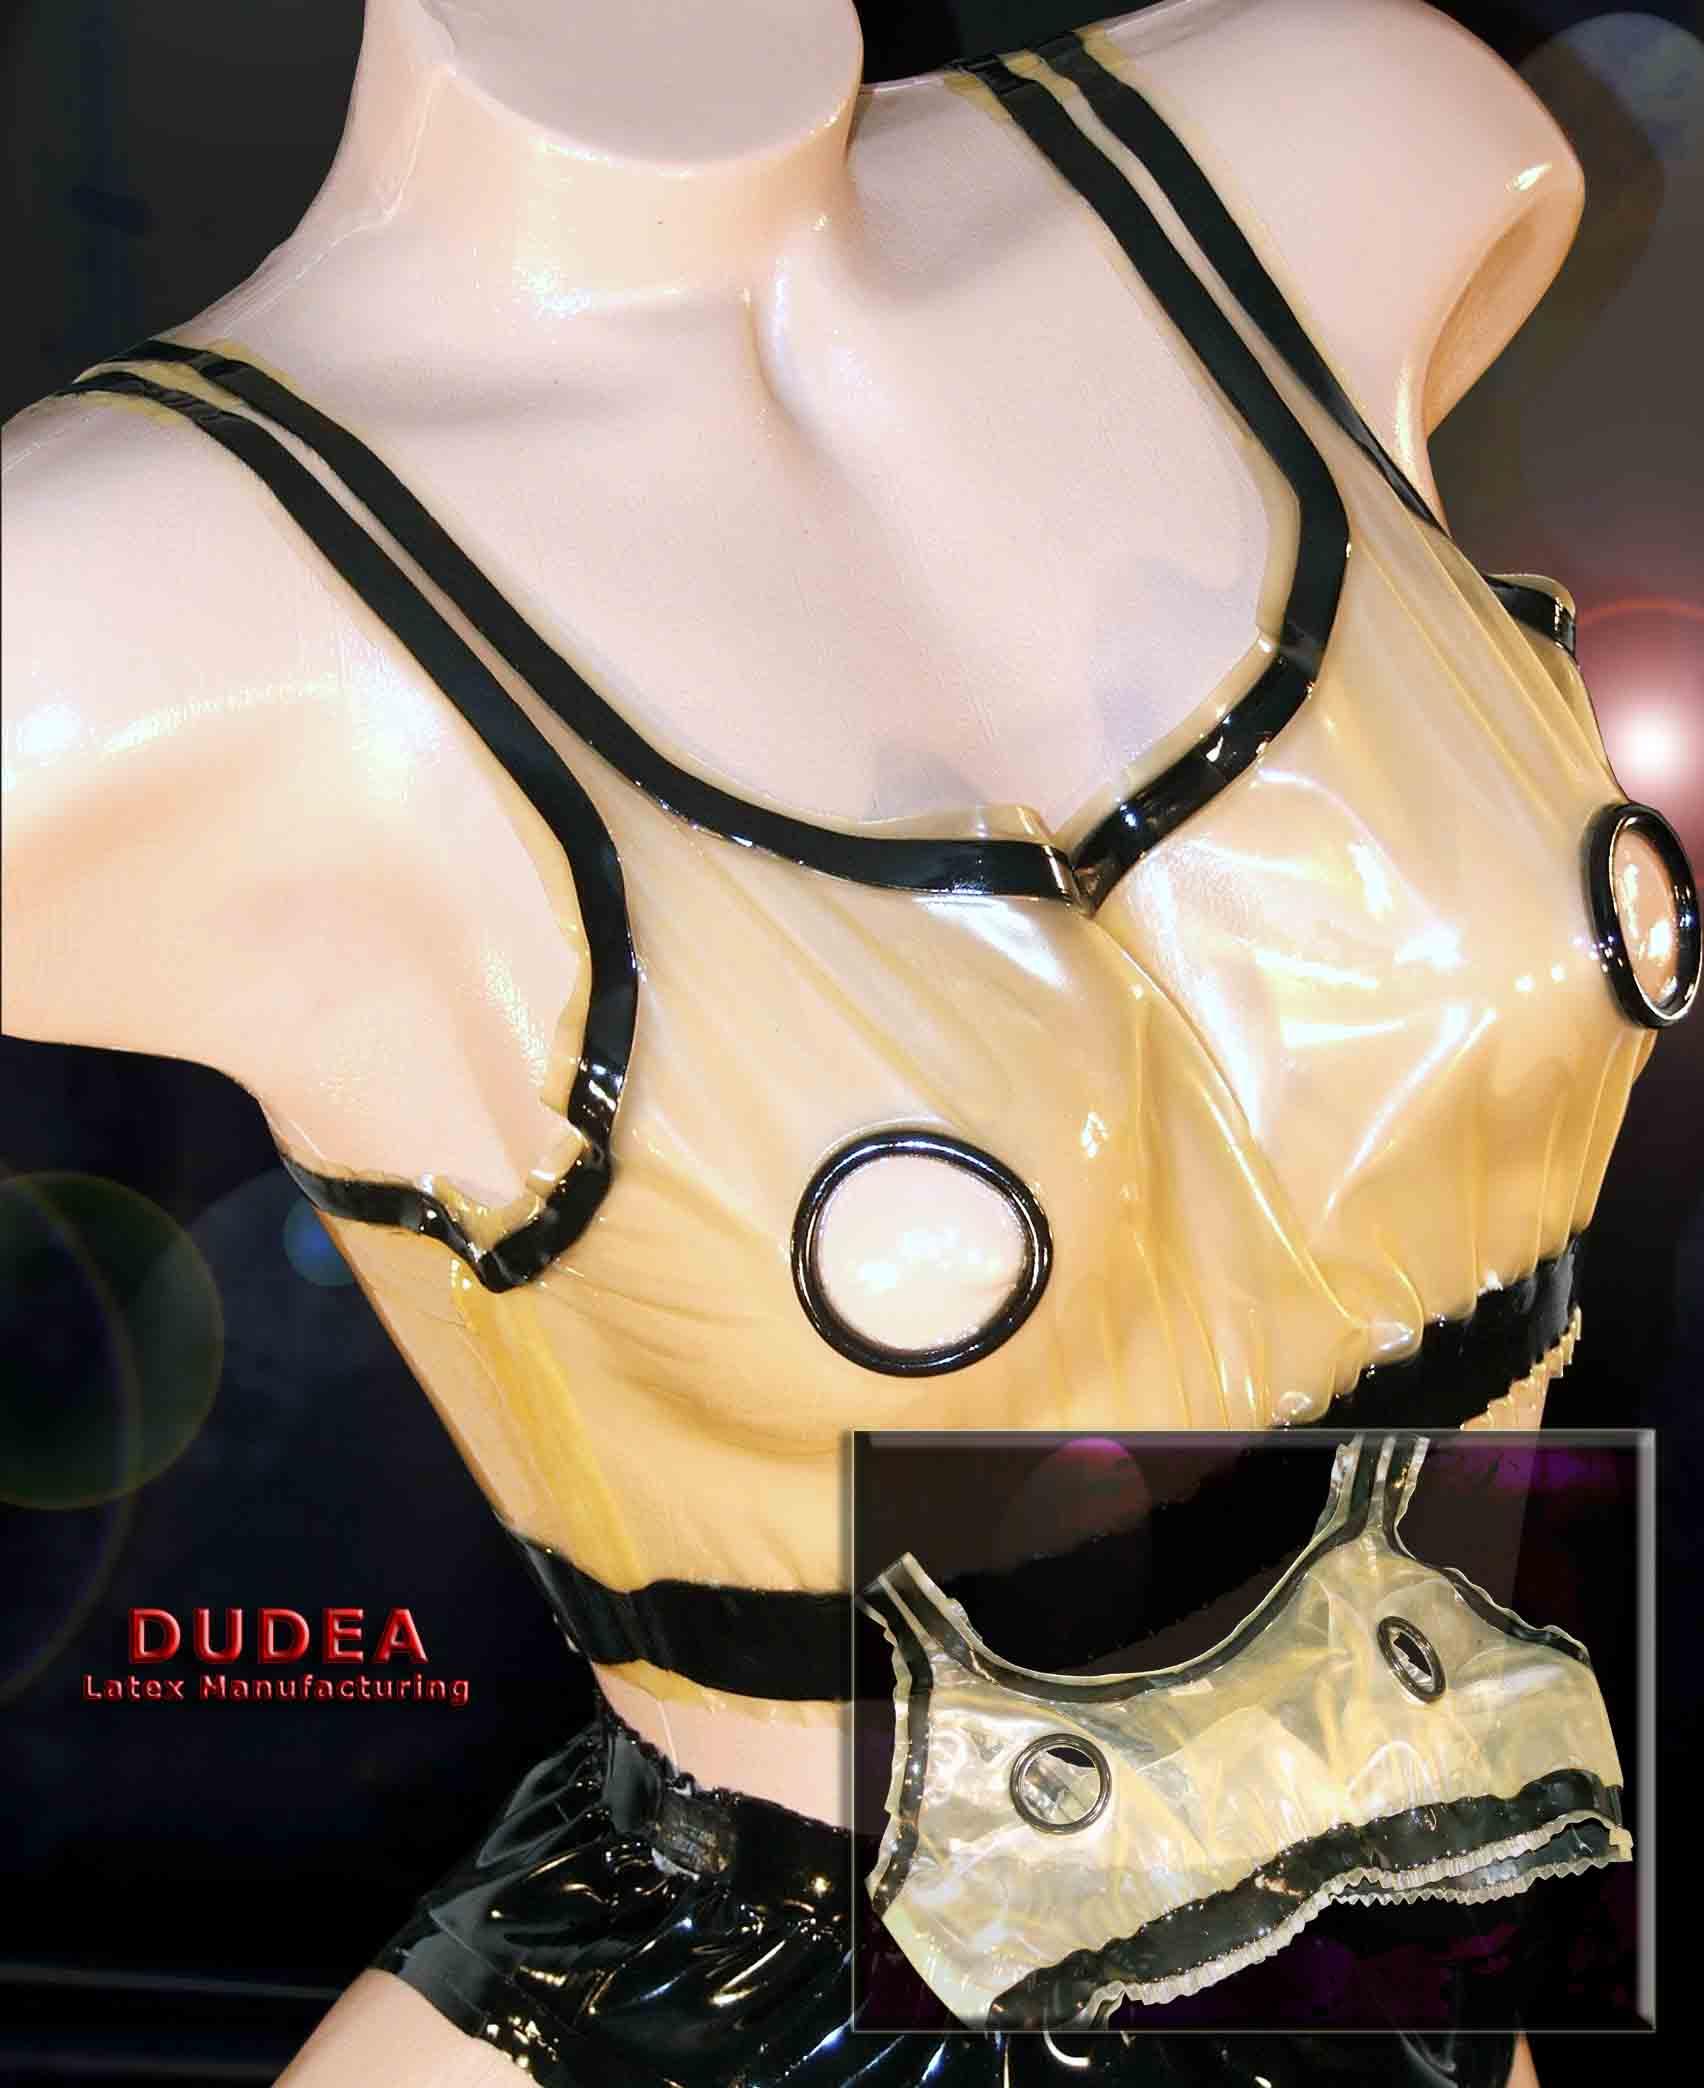 Rubber Latex Bra open at nipple